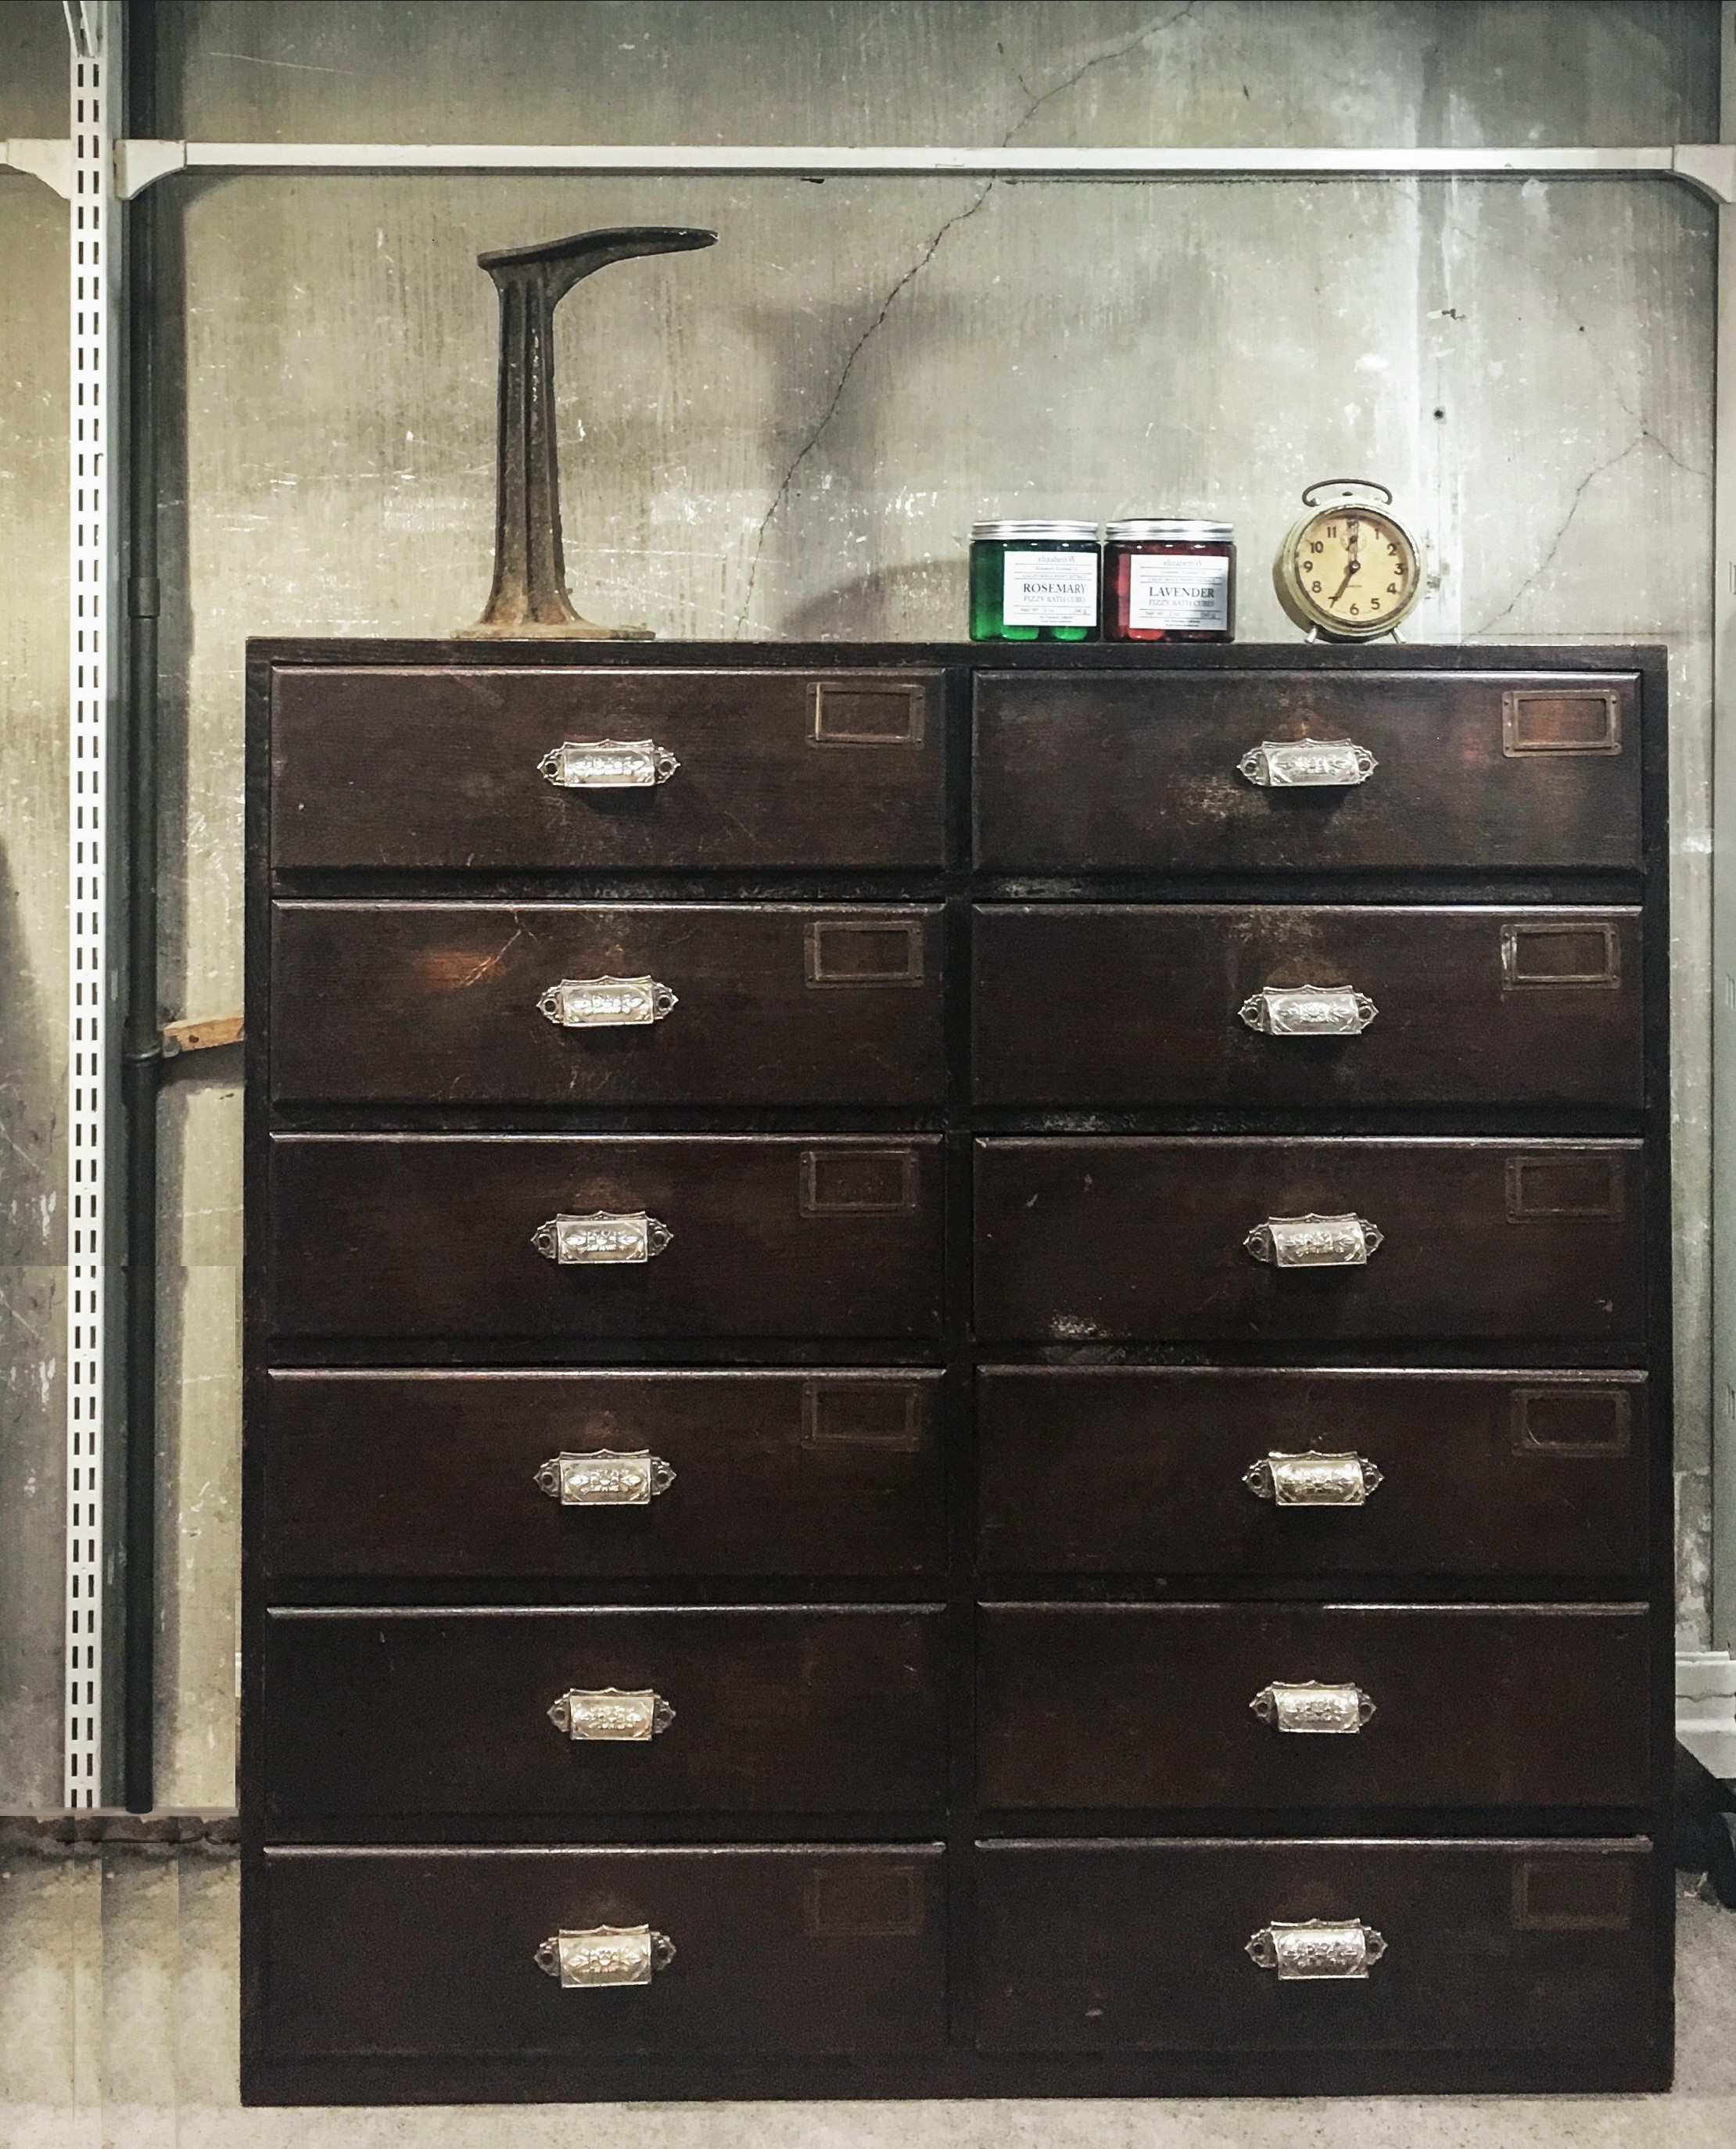 Antique Drawer Cabinet/ドロワー キャビネット/アンティーク チェスト